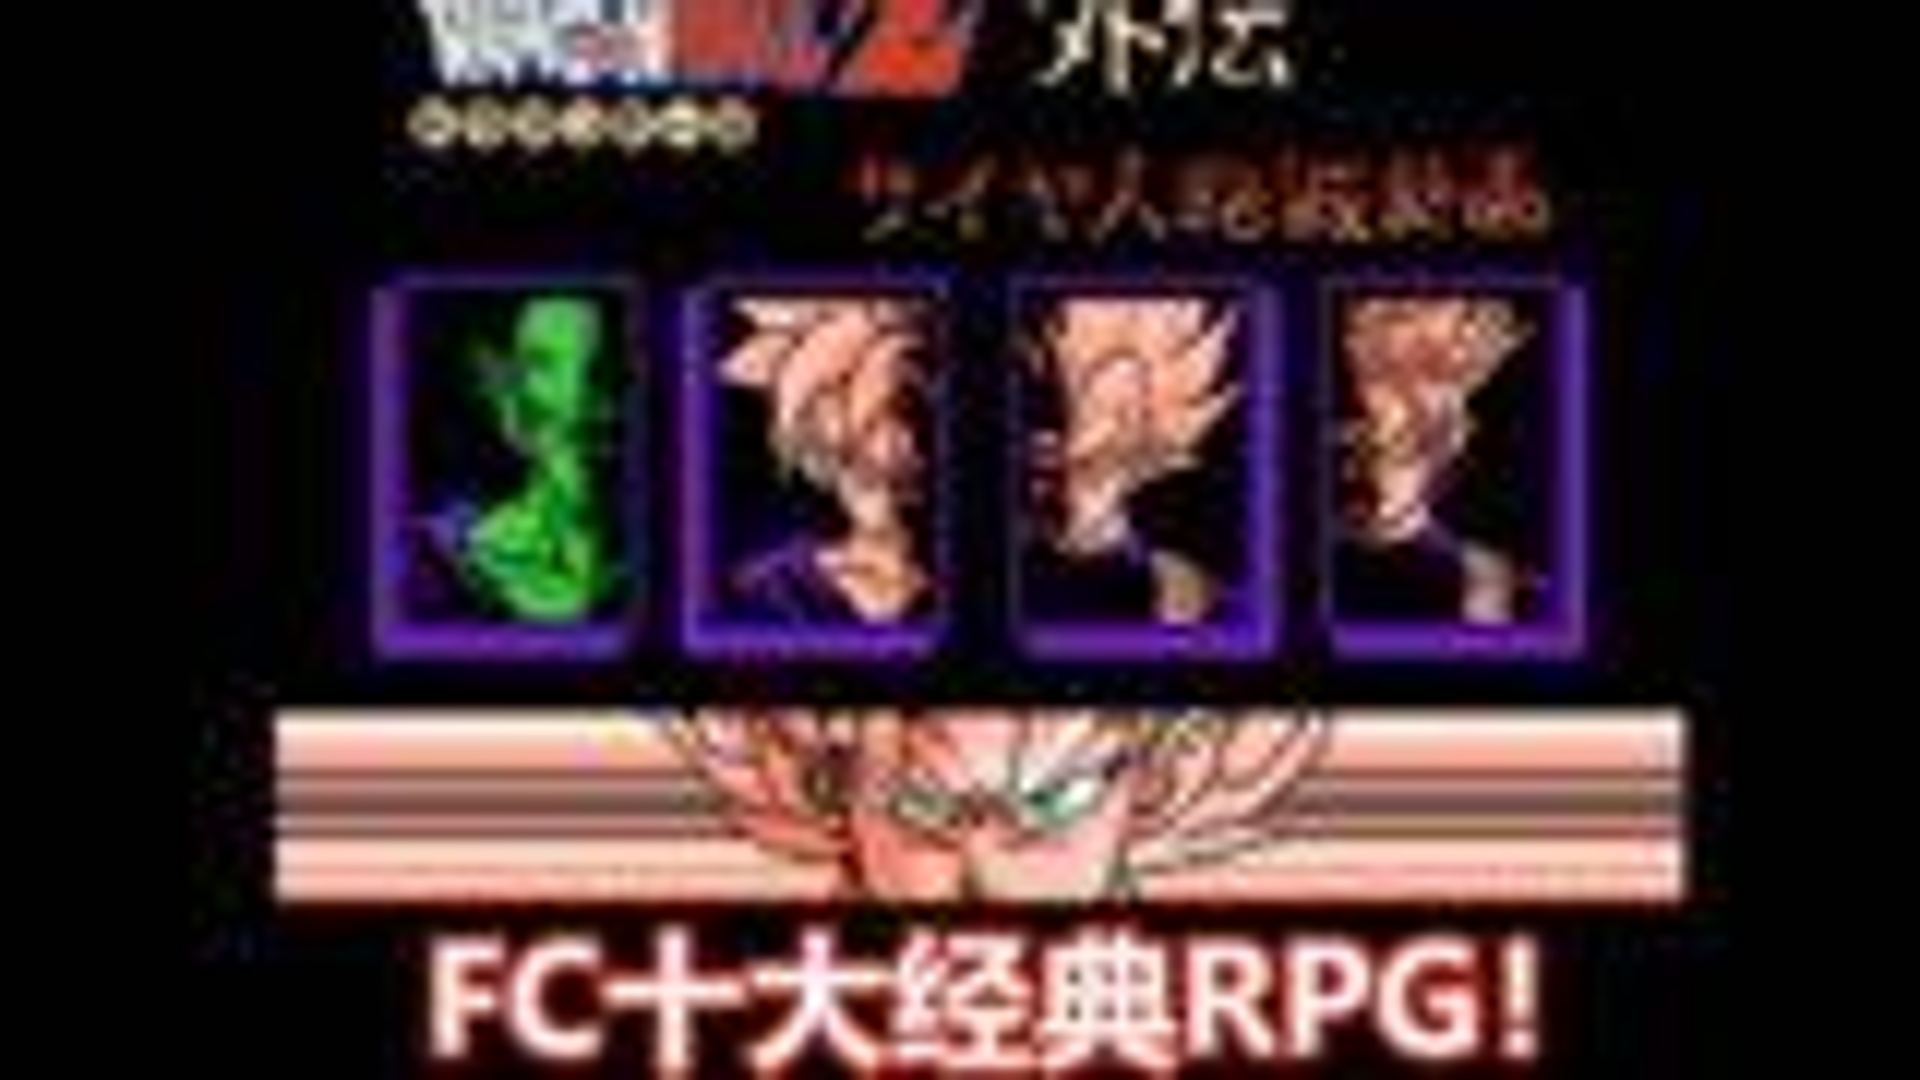 FC十大经典RPG下期,传说的开始